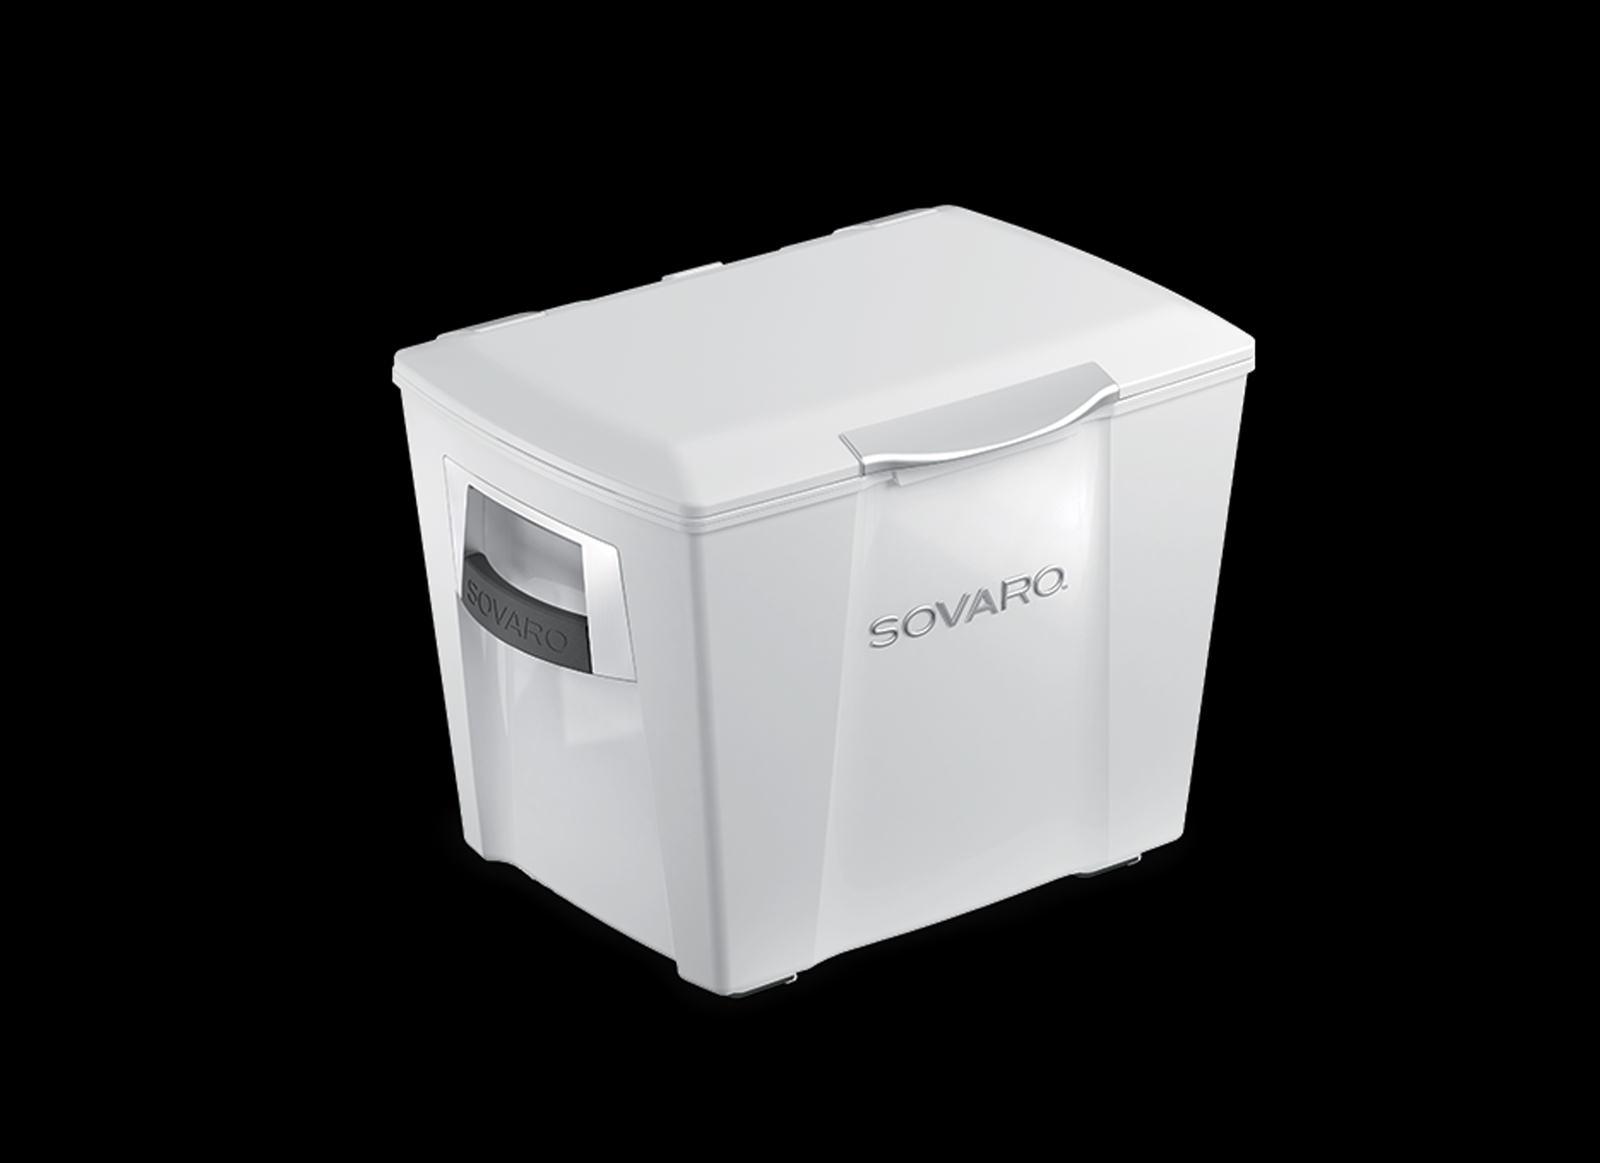 Sovaro Coolers Chimney Pro